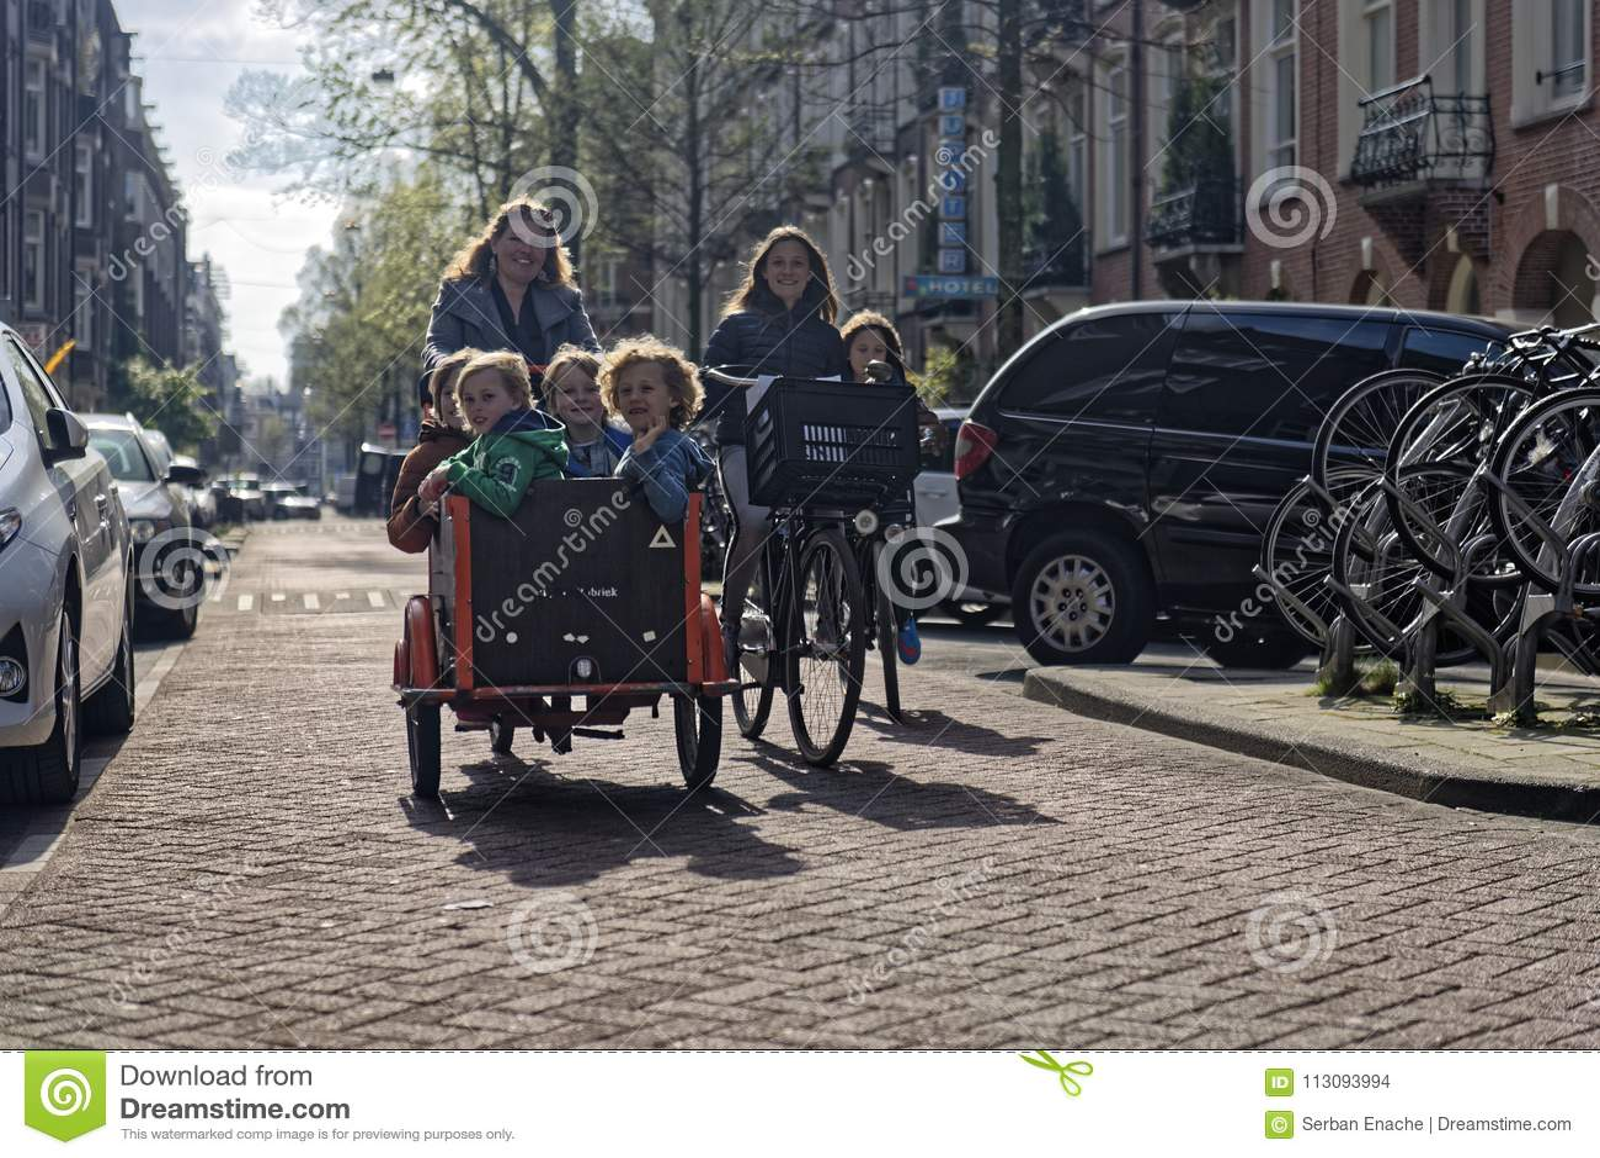 Familias en las bicis, Amsterdam, Holanda